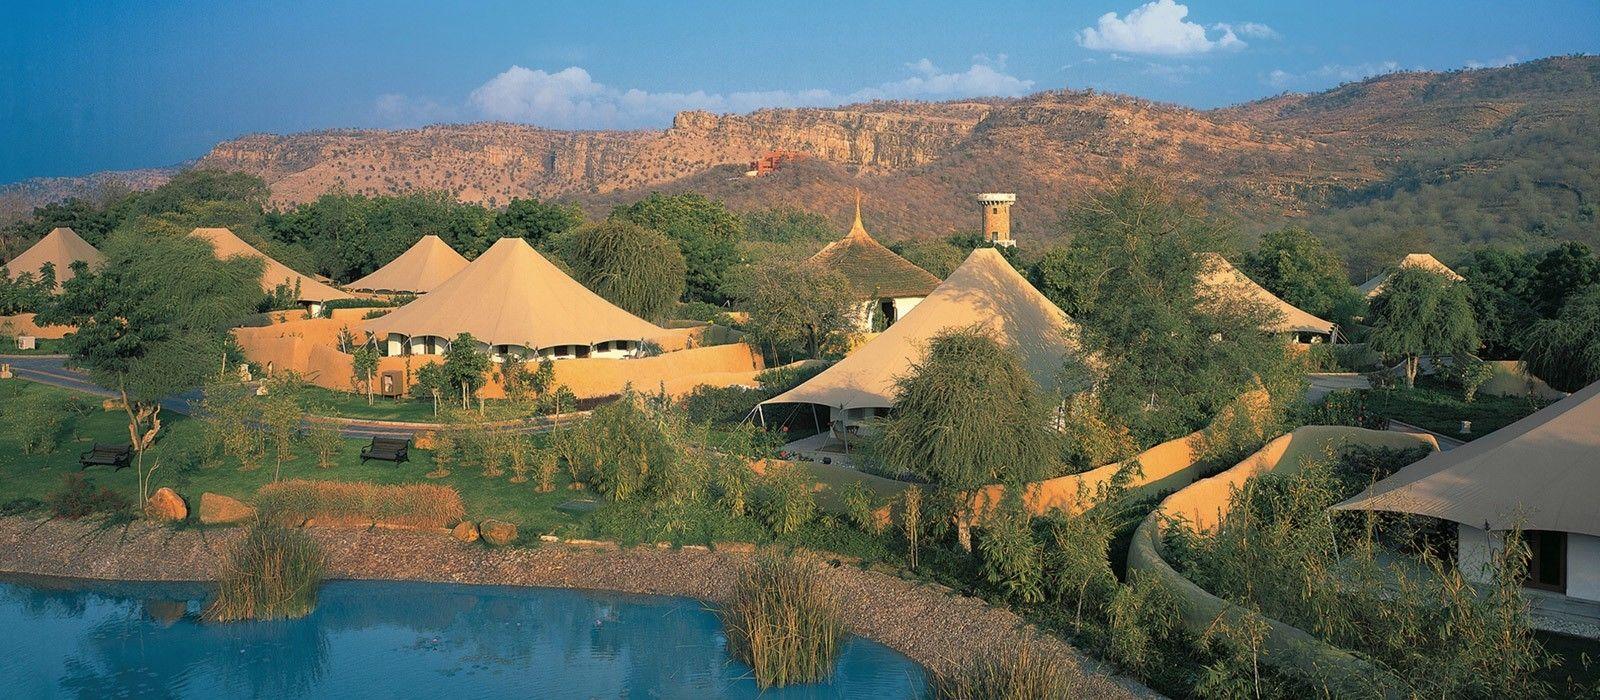 Oberoi Exclusive: Royal Rajasthan and Safari Special Tour Trip 3